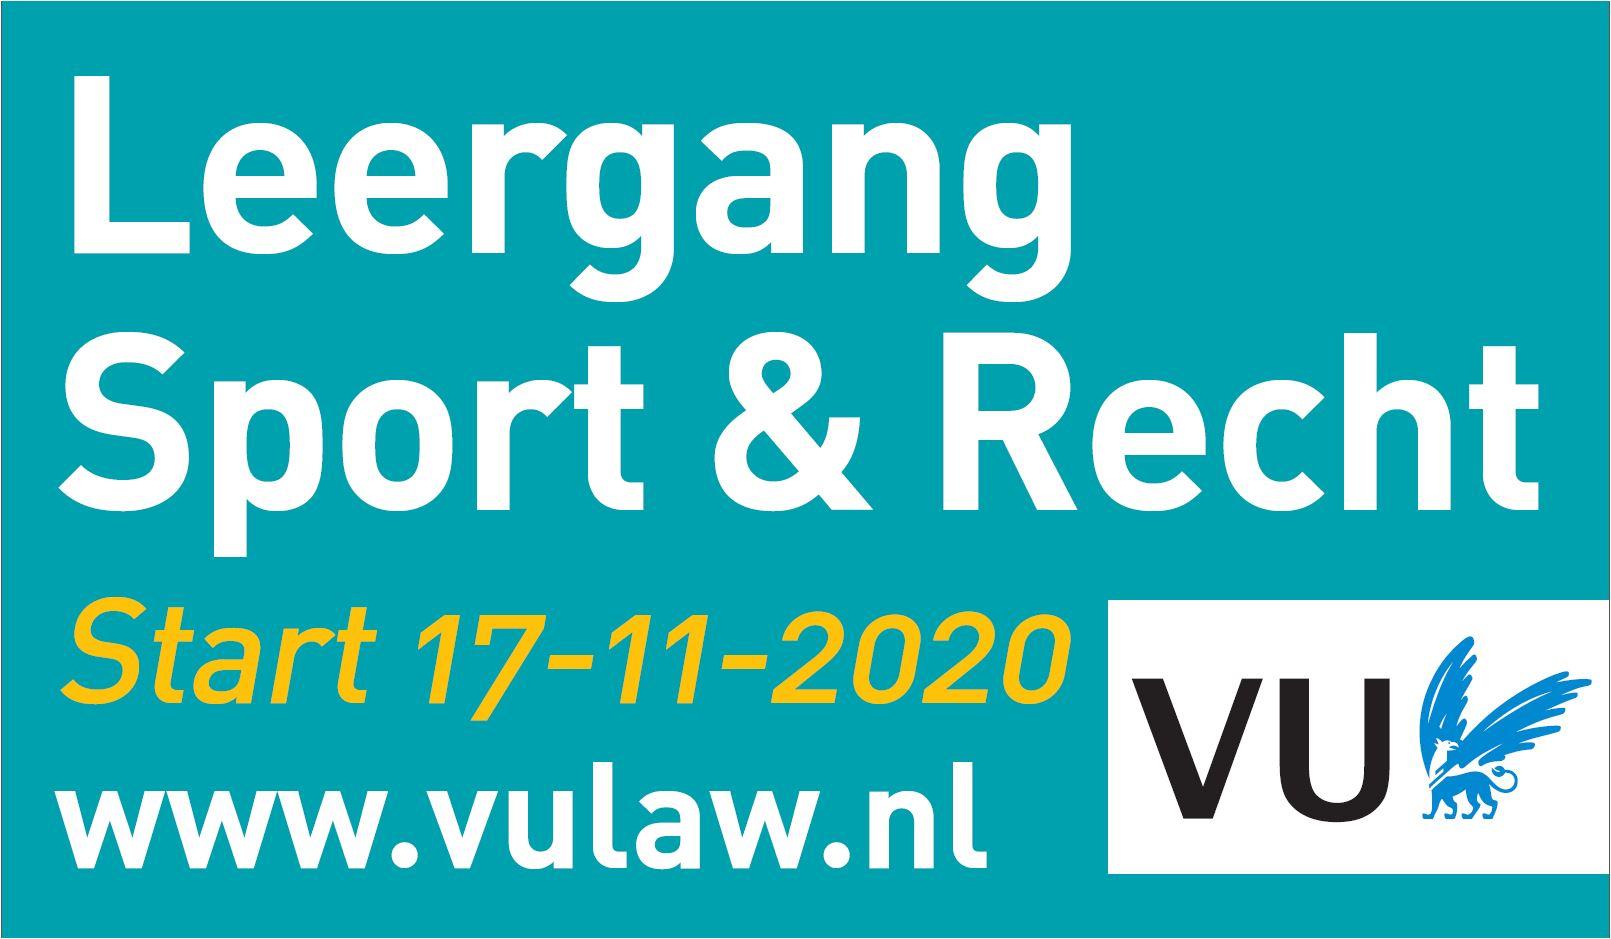 Leergang Sport & Recht